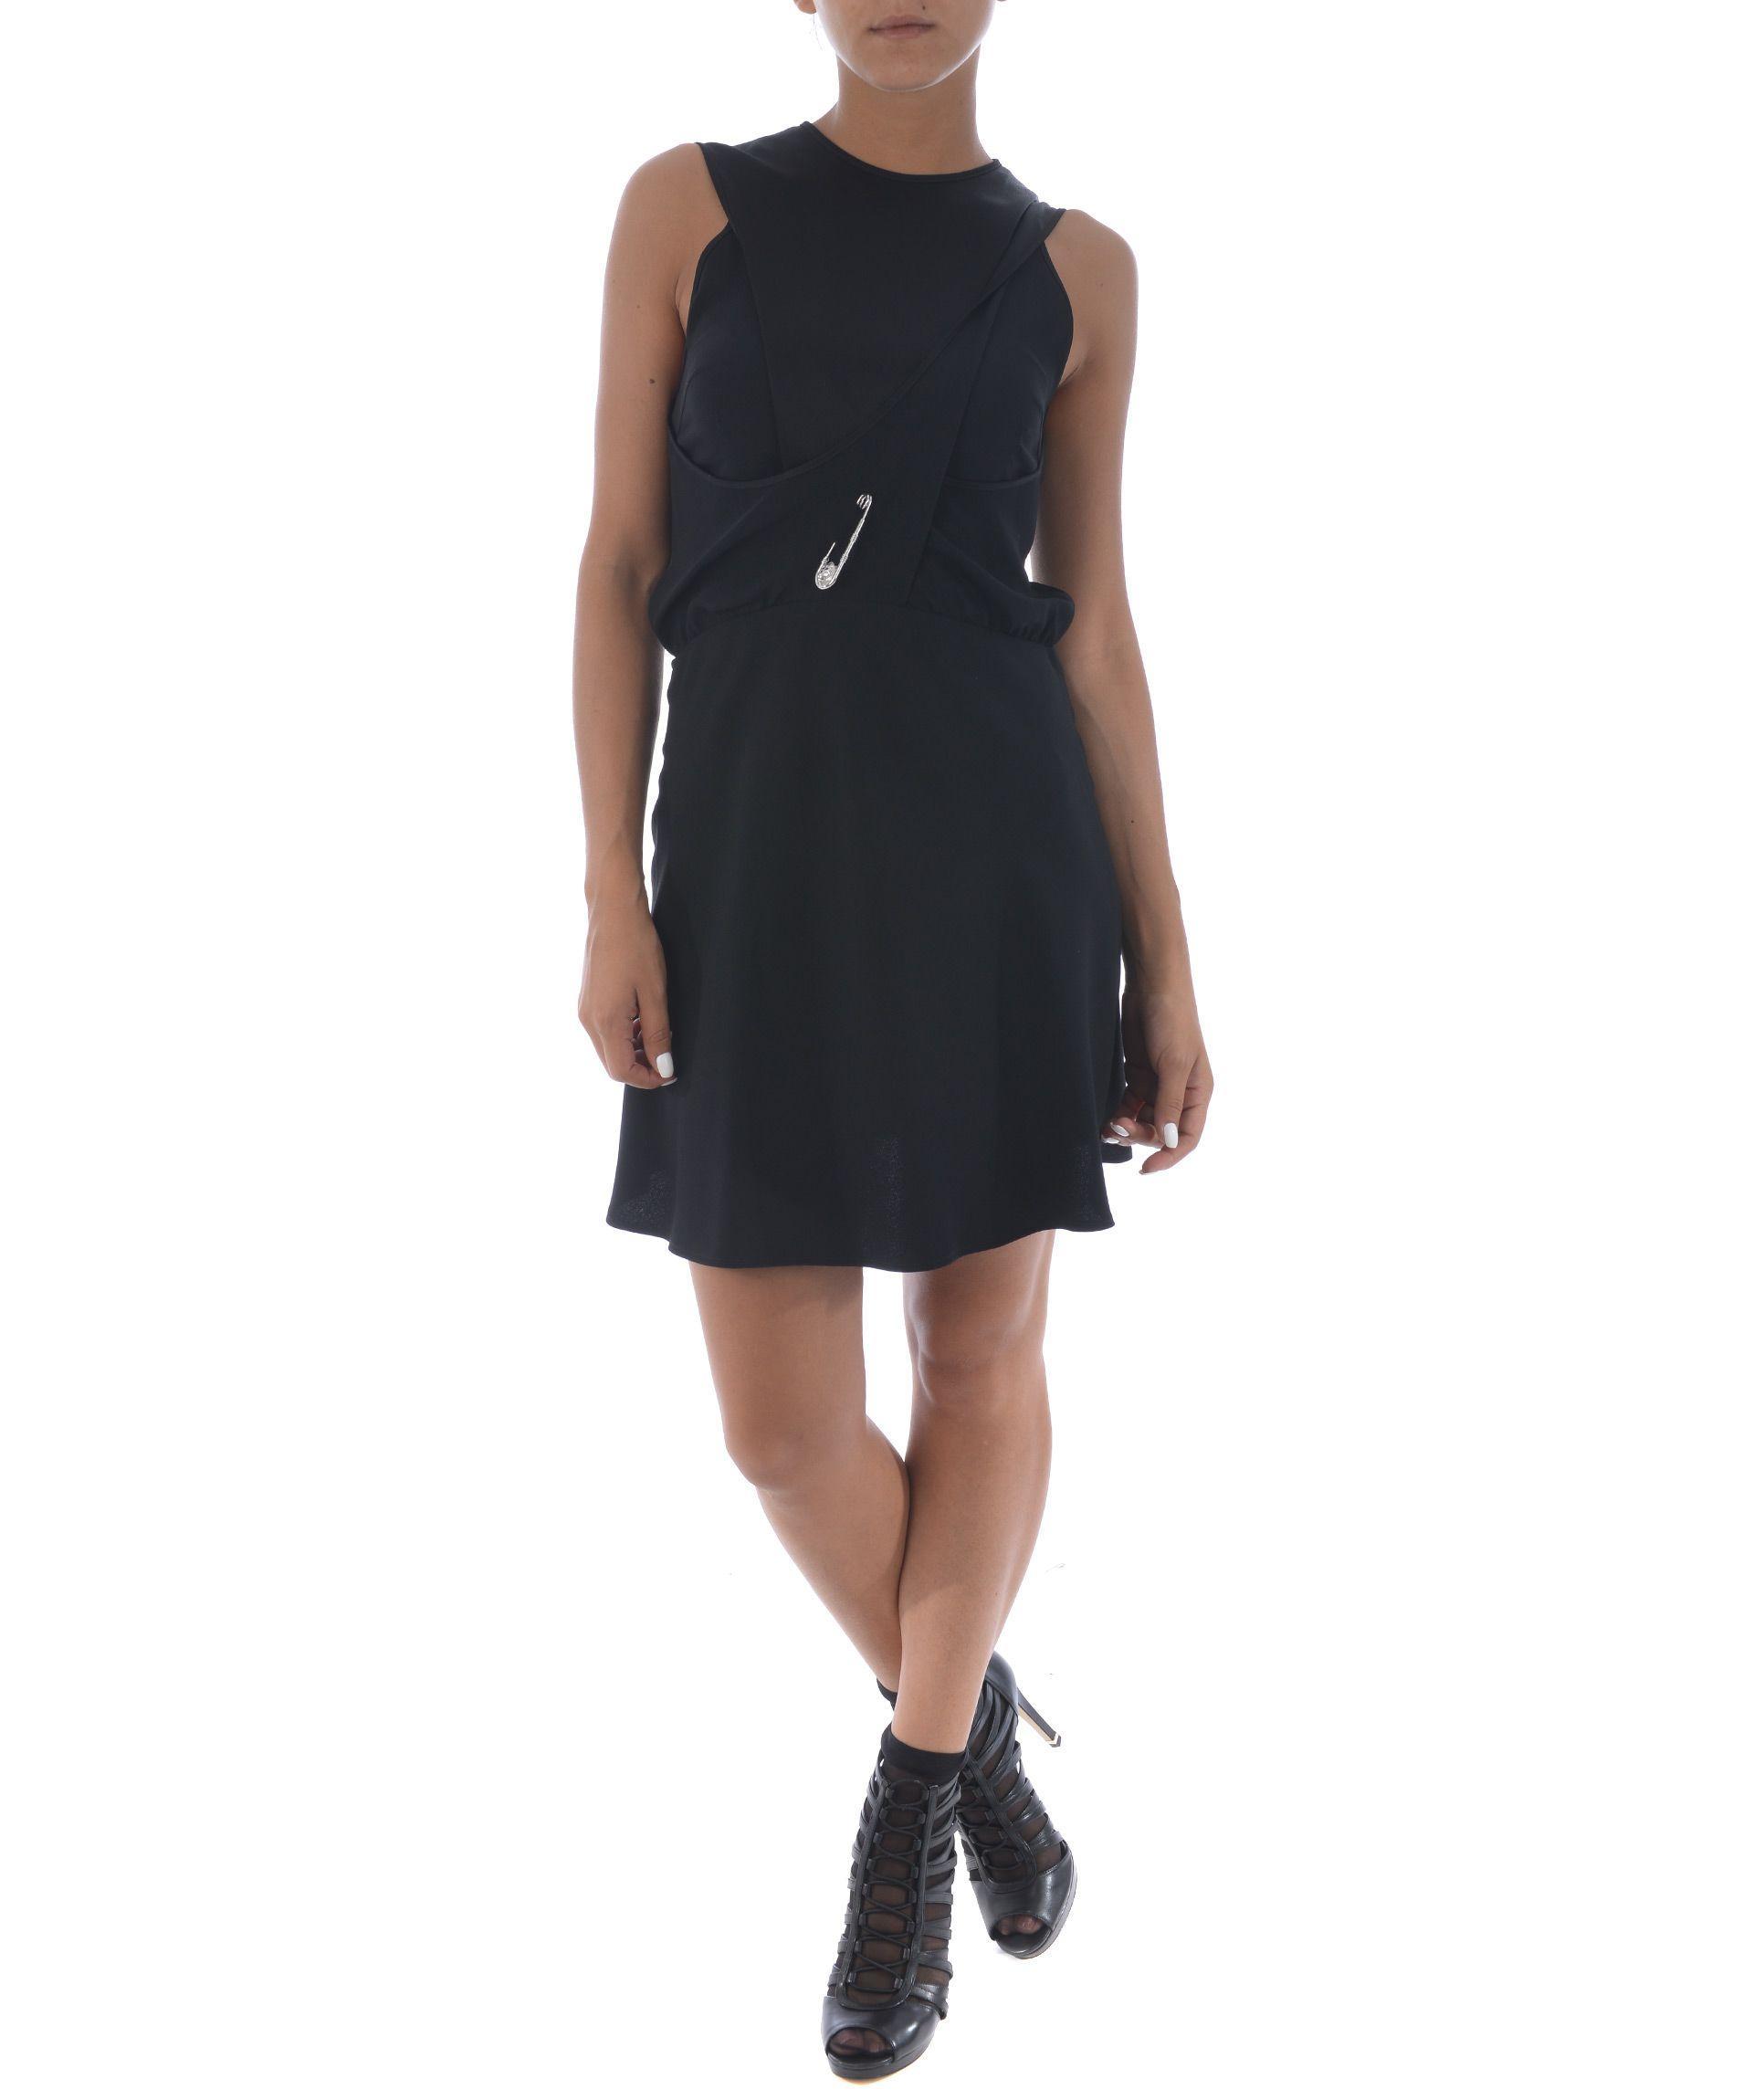 Versus Safety Pin Sleeveless Dress In Nero